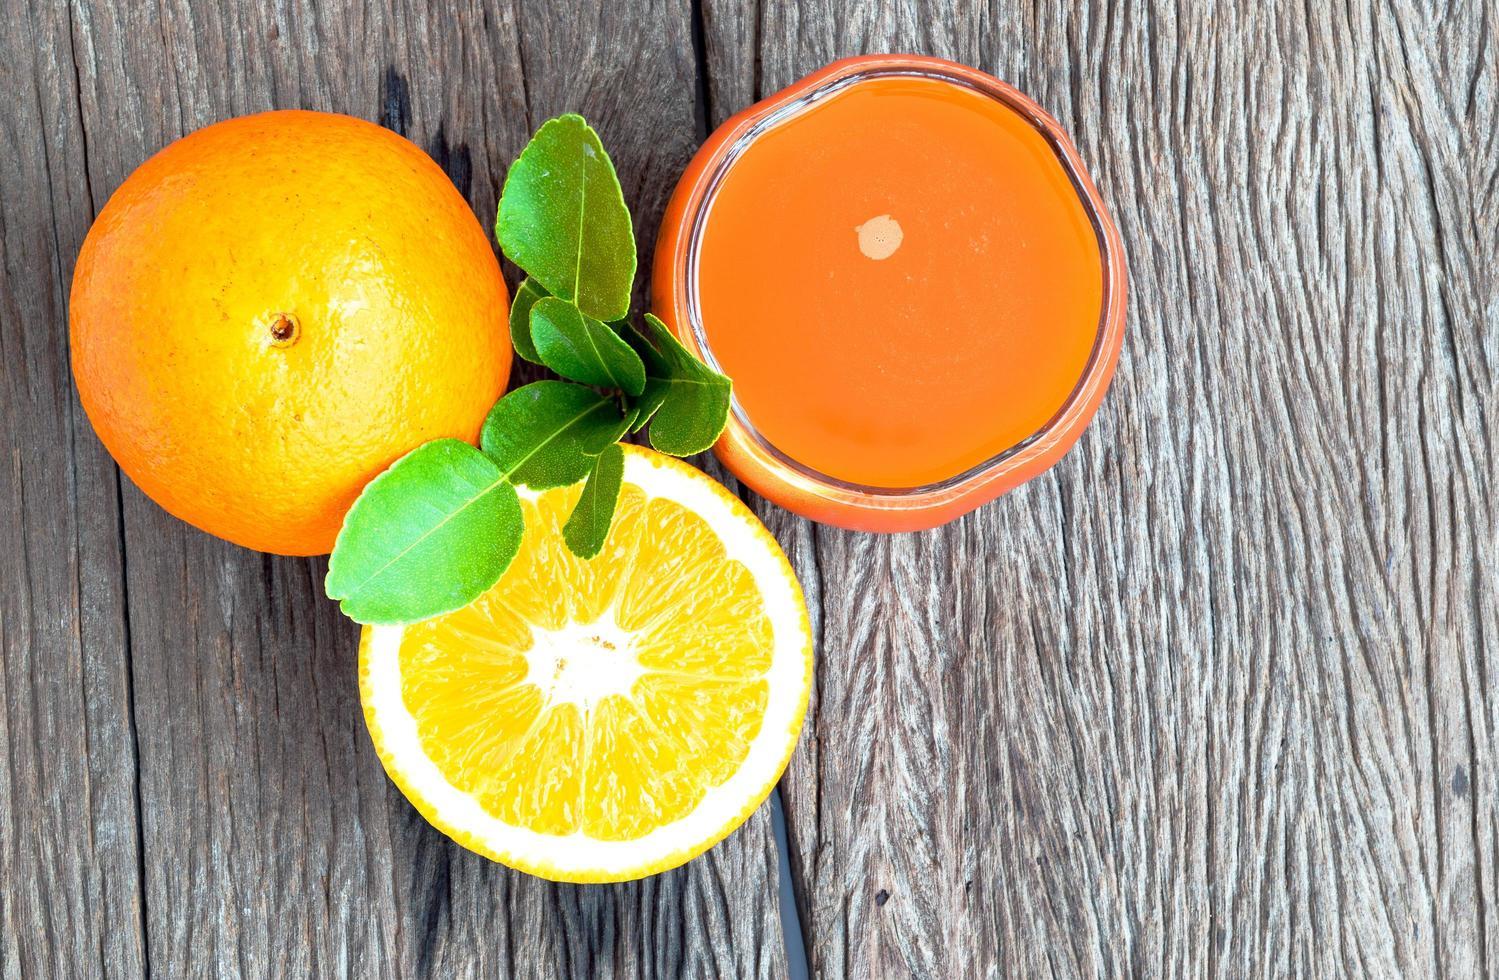 Orange juice and oranges on a wooden floor photo